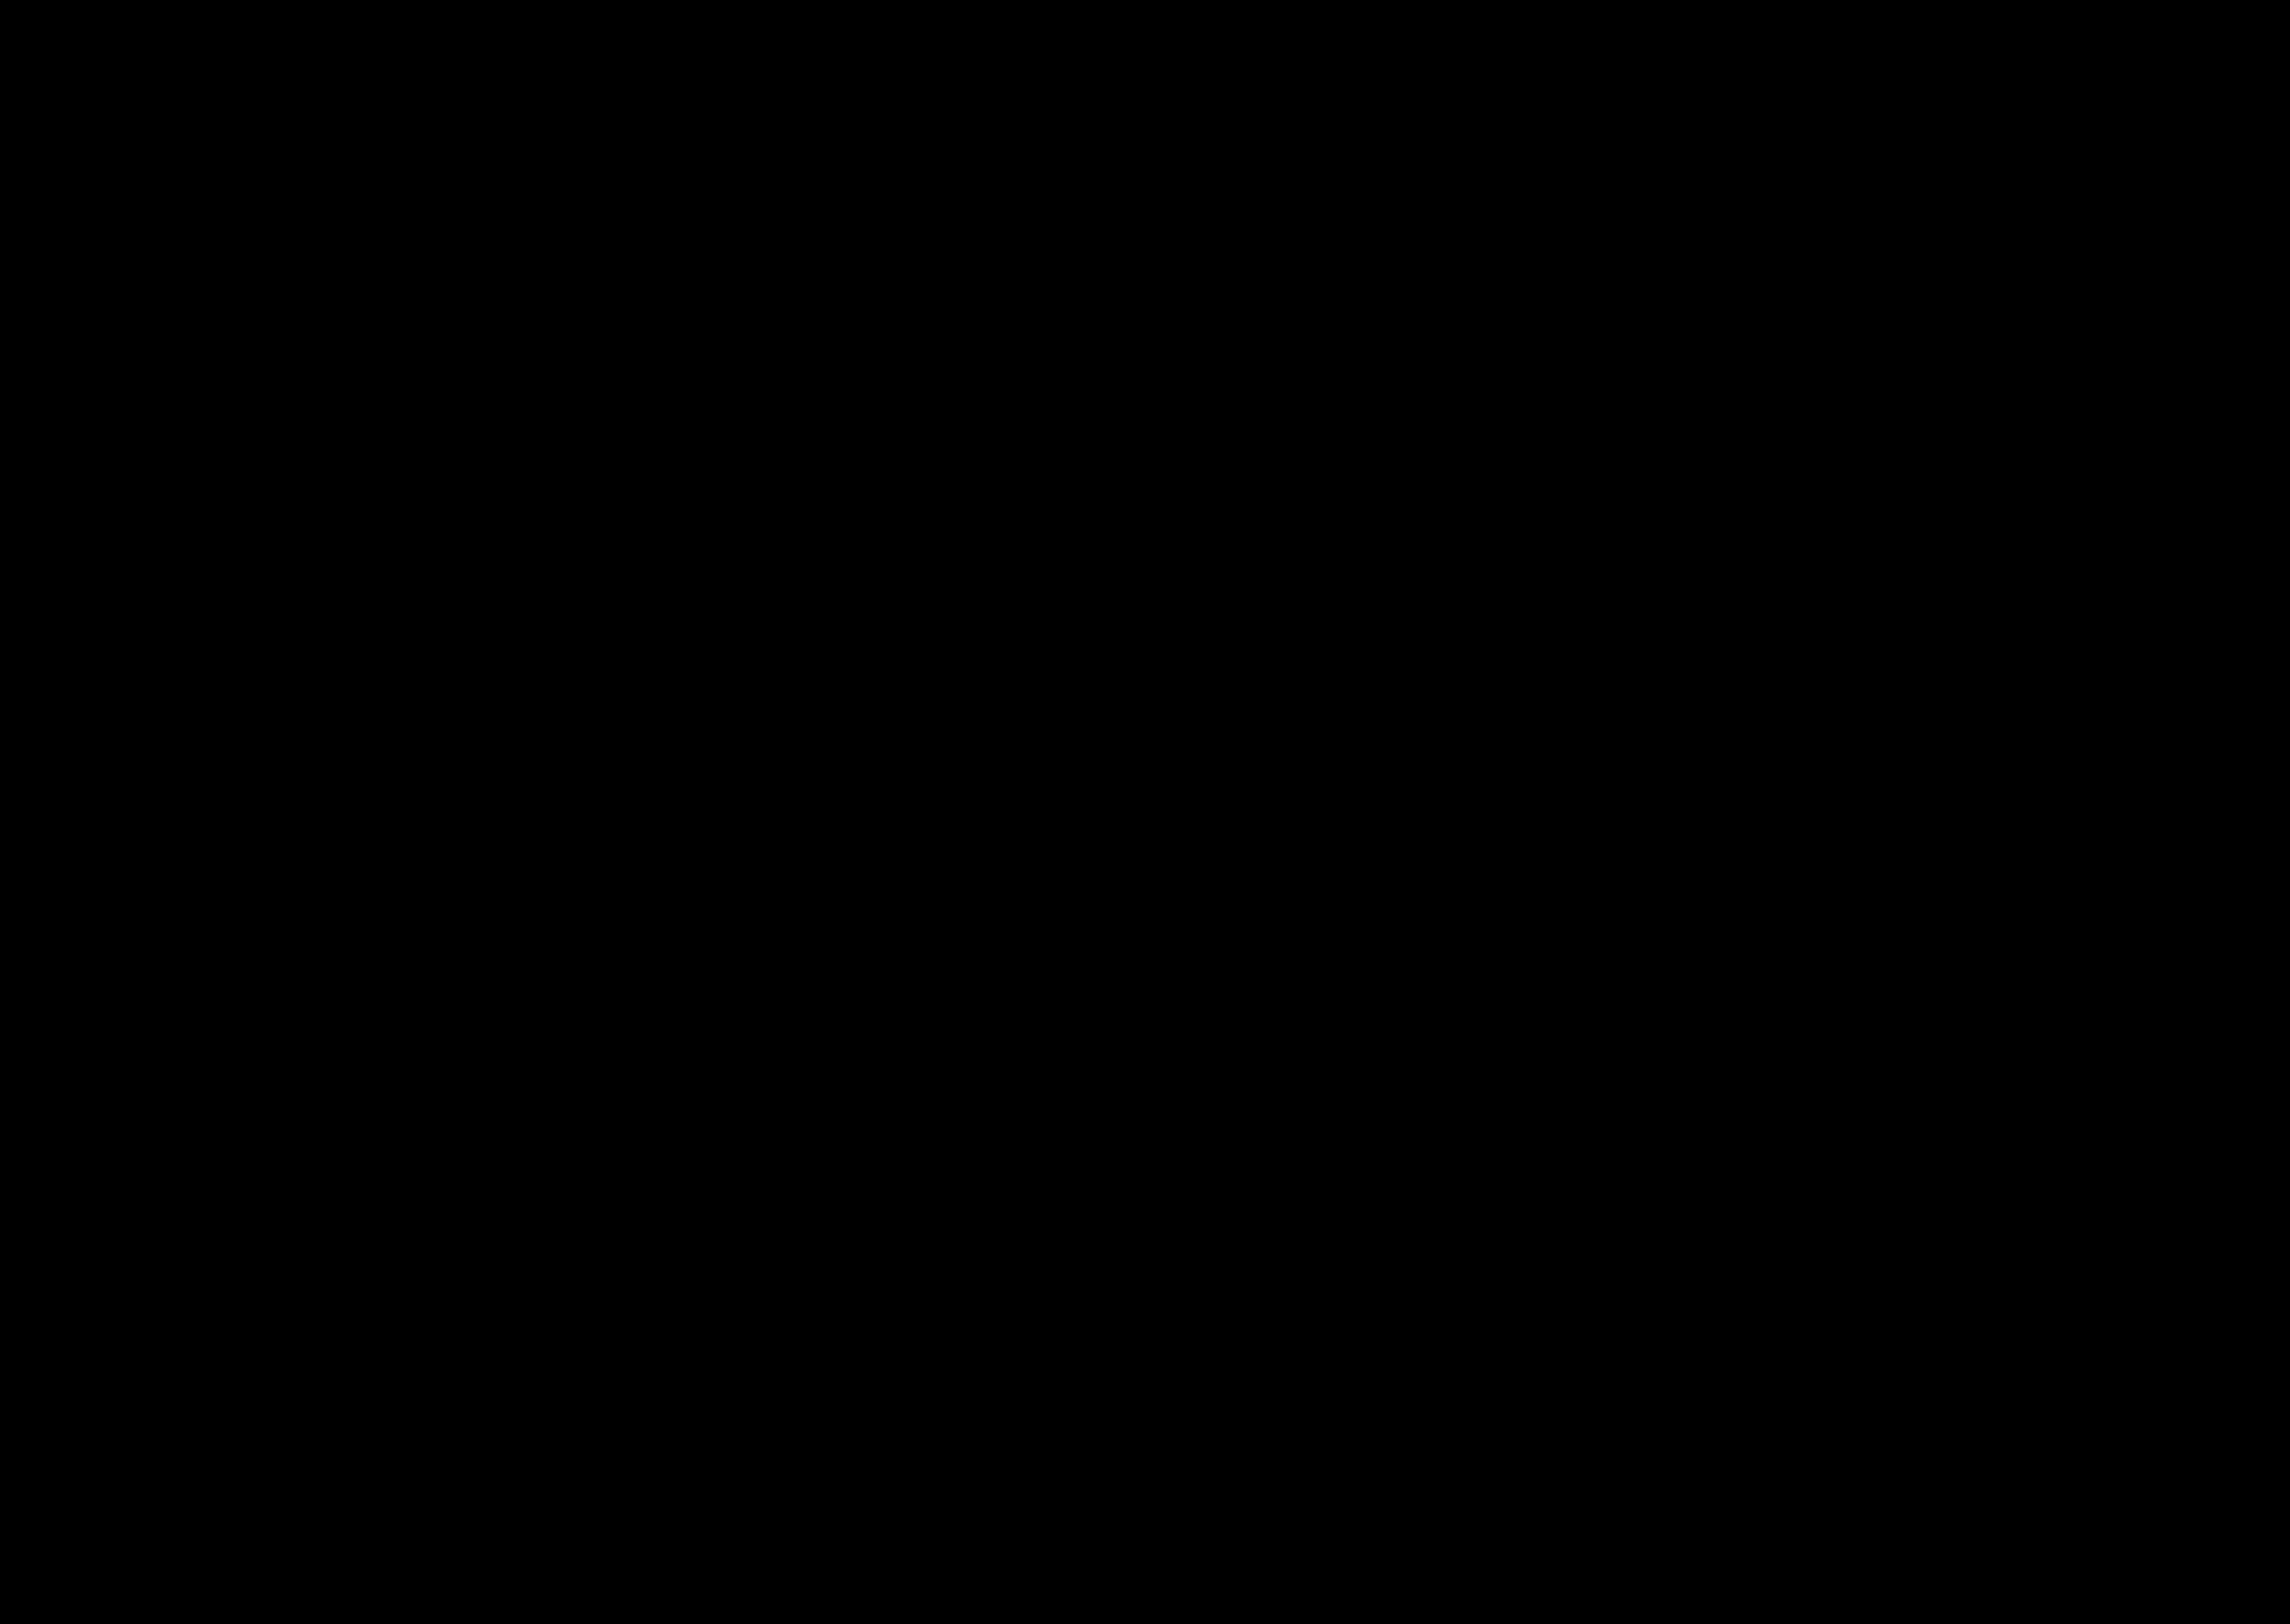 2400x1702 Clipart